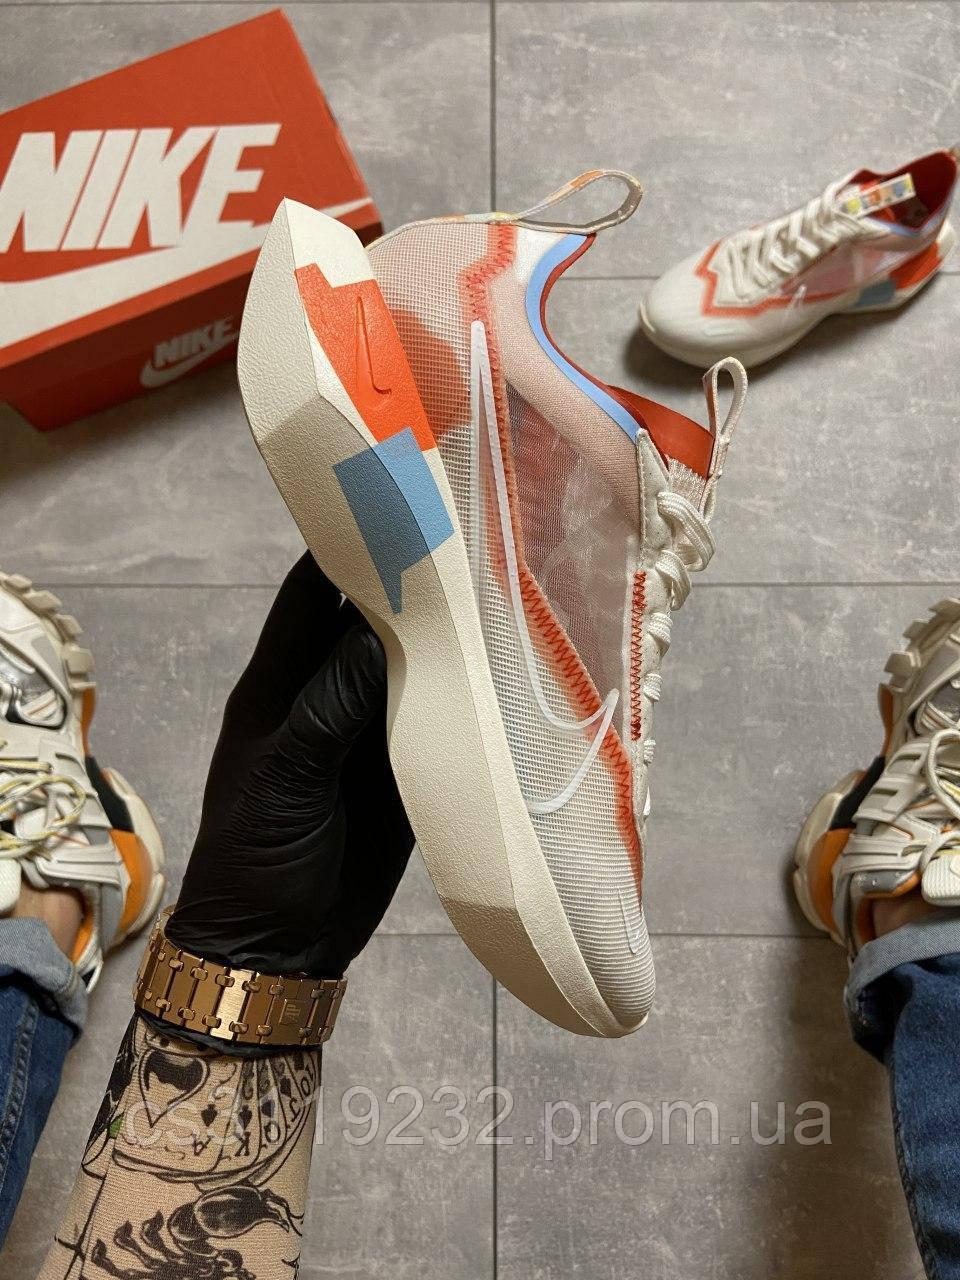 Женские кроссовки Nike Vista White Orange (белые)